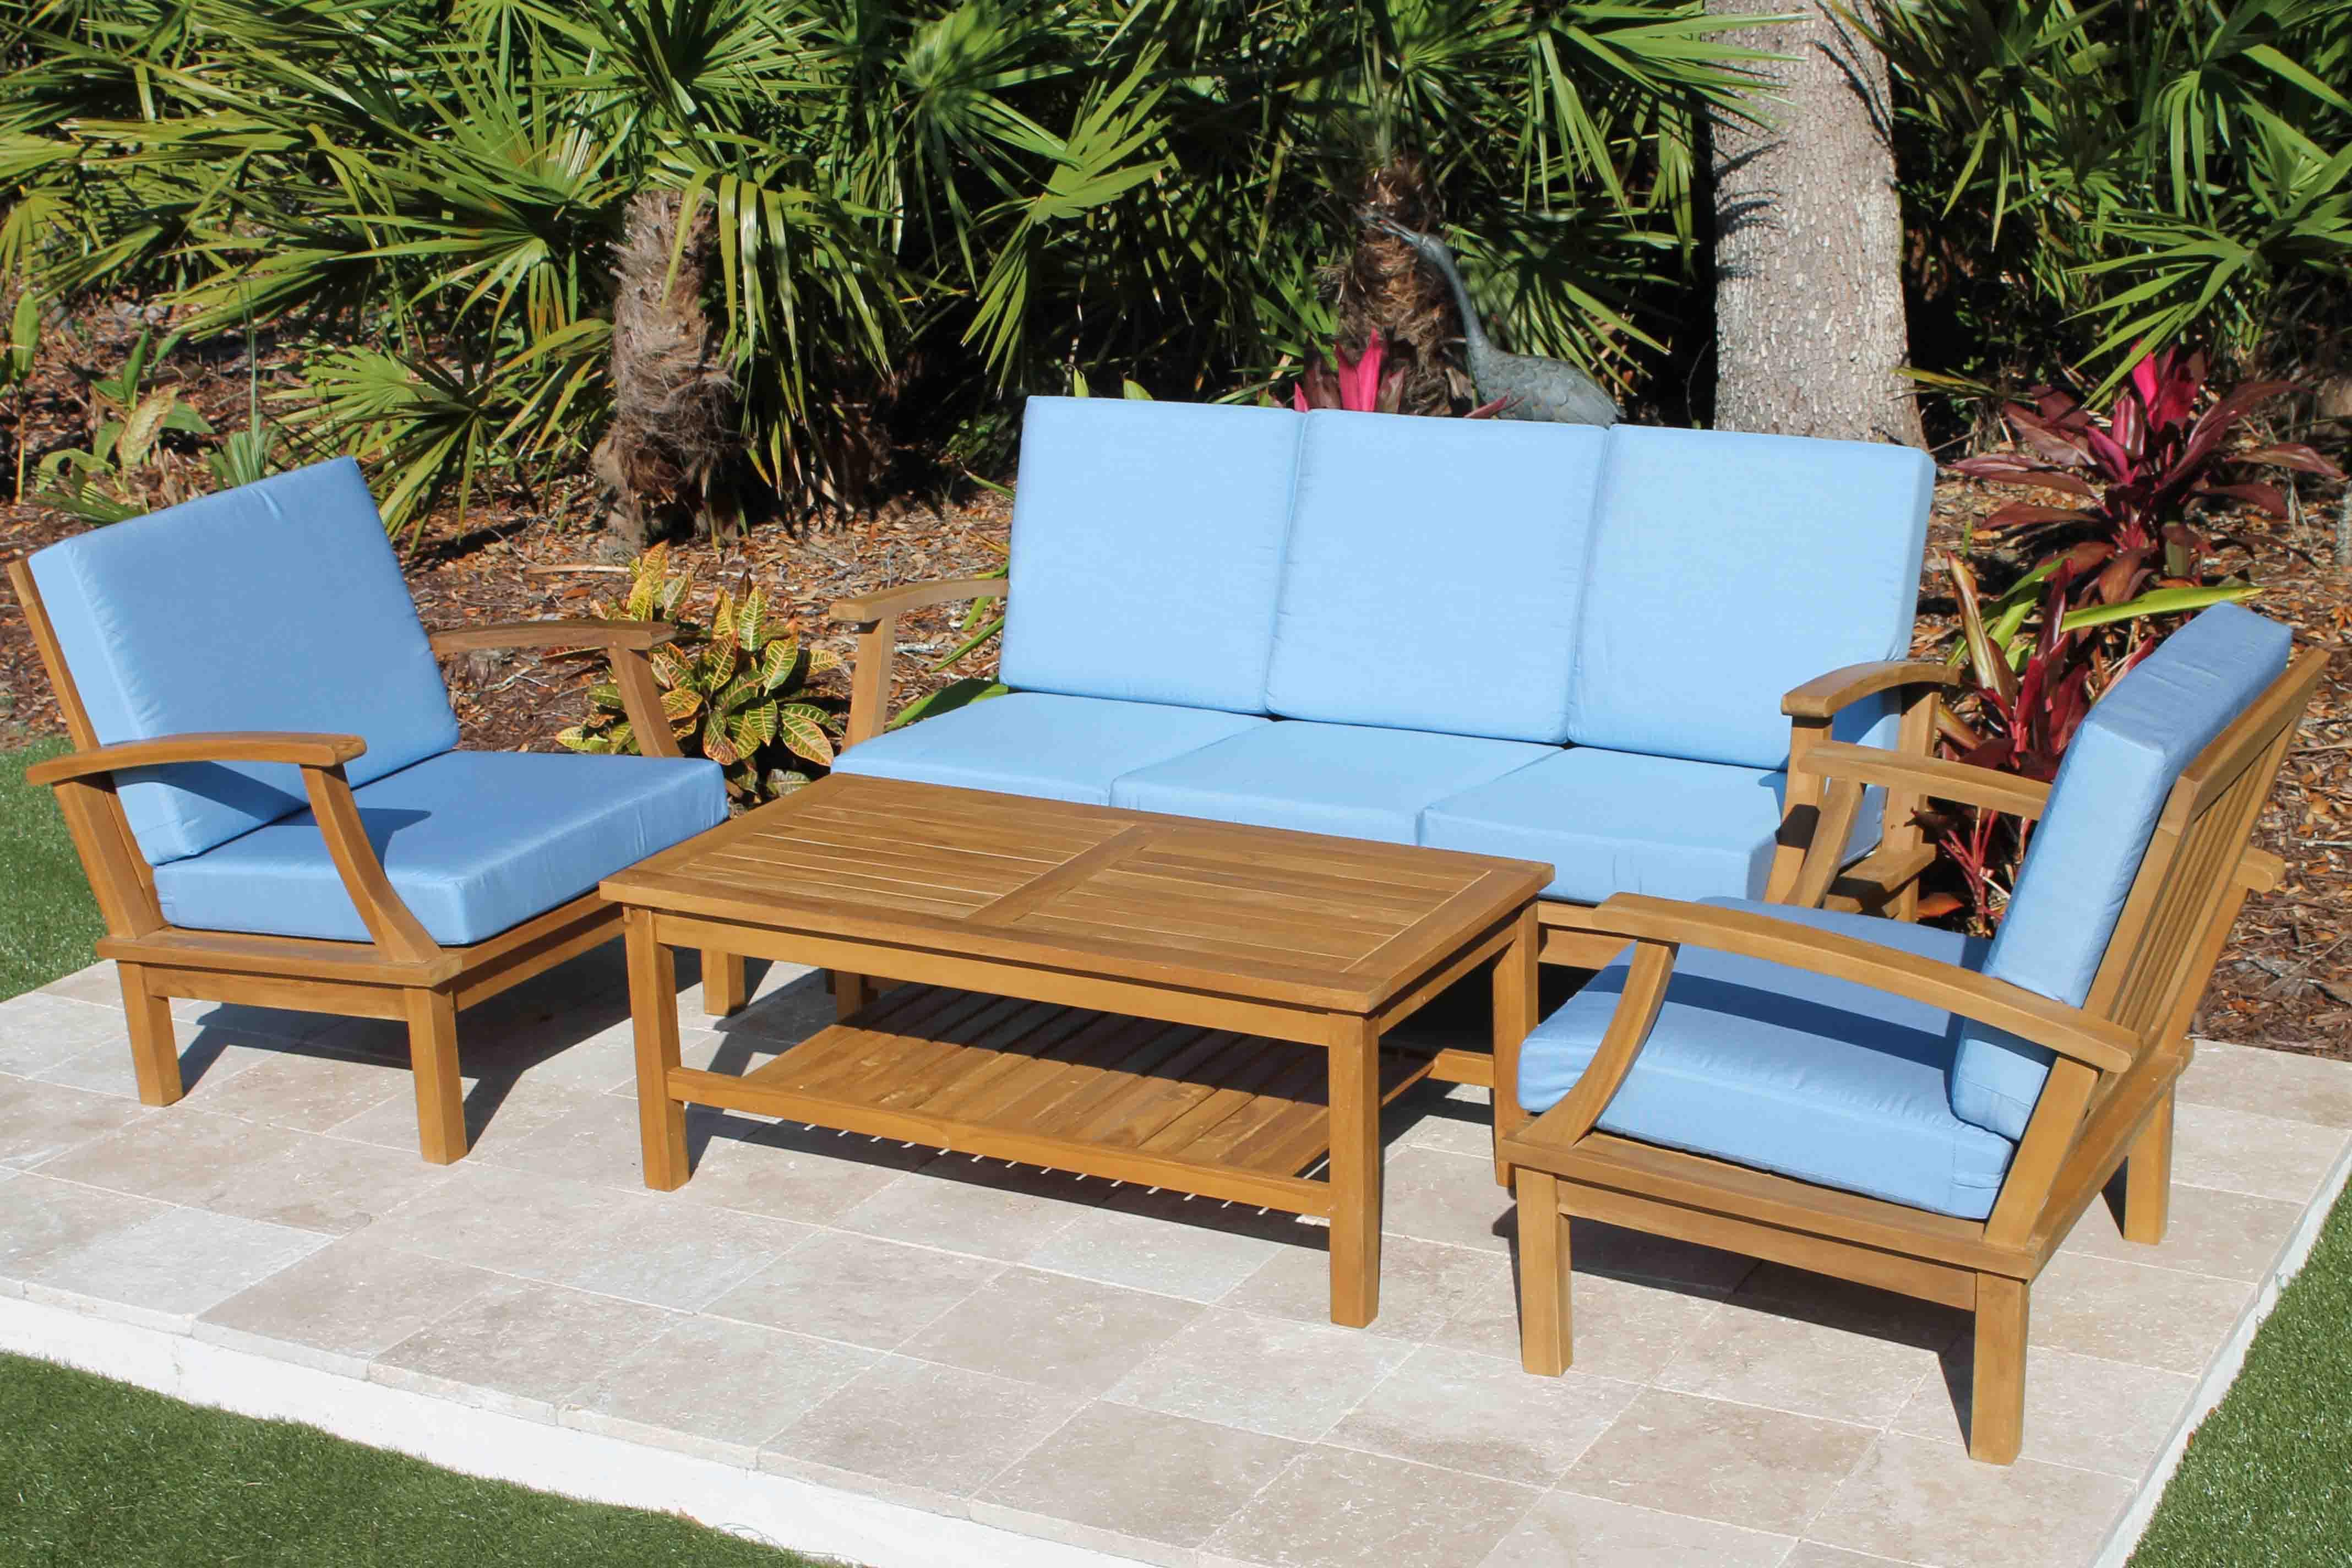 Clearance Sale Teak Deep Seat 5 Seat Set Full Sunbrella Cushions